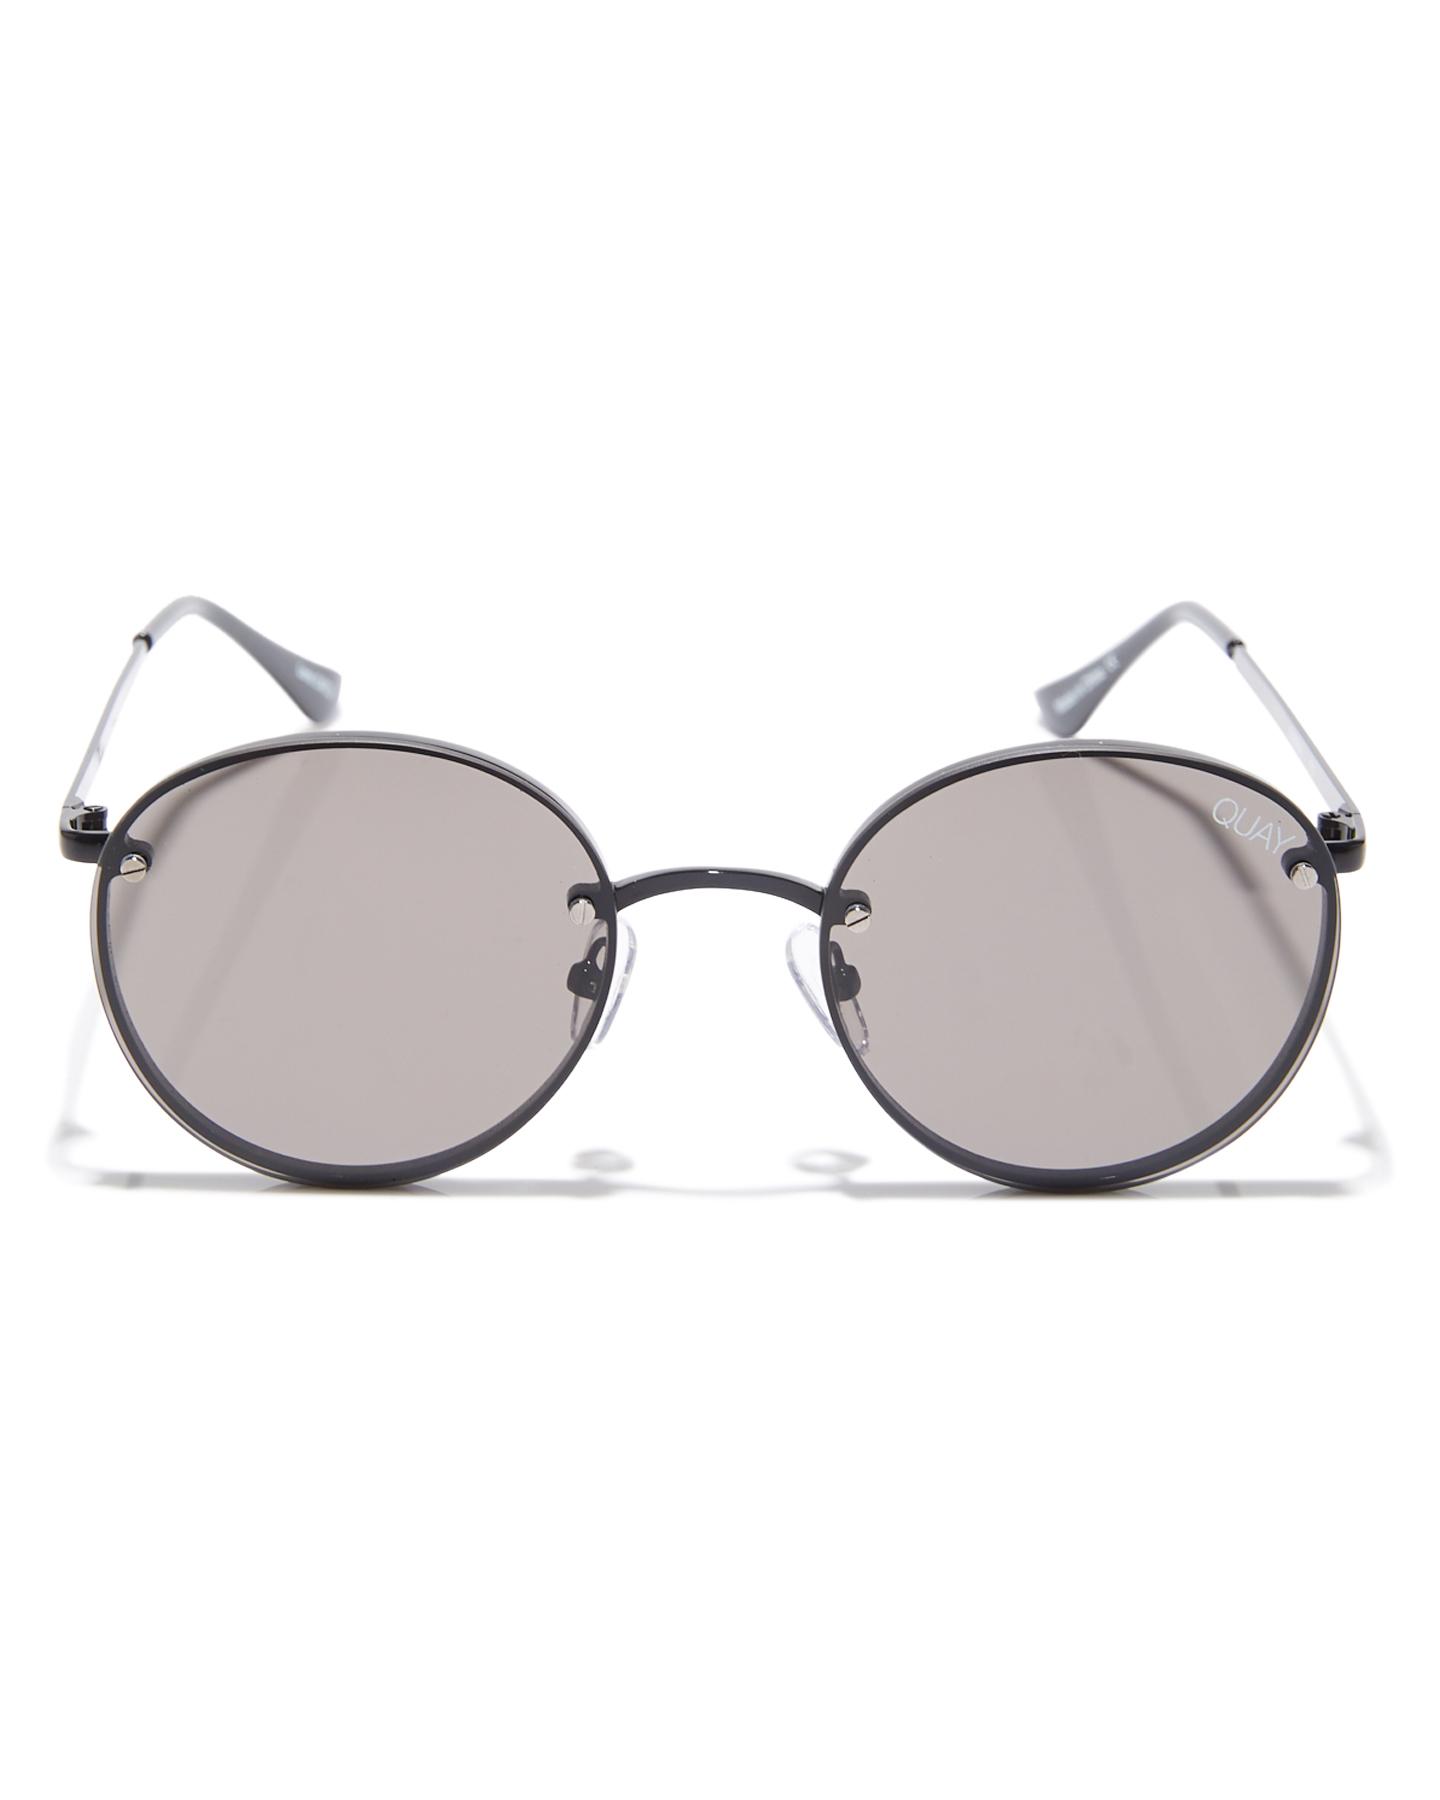 e065a7ba788dc New Quay Eyewear Women s X Elle Ferguson Farrah Sunglasses Gold